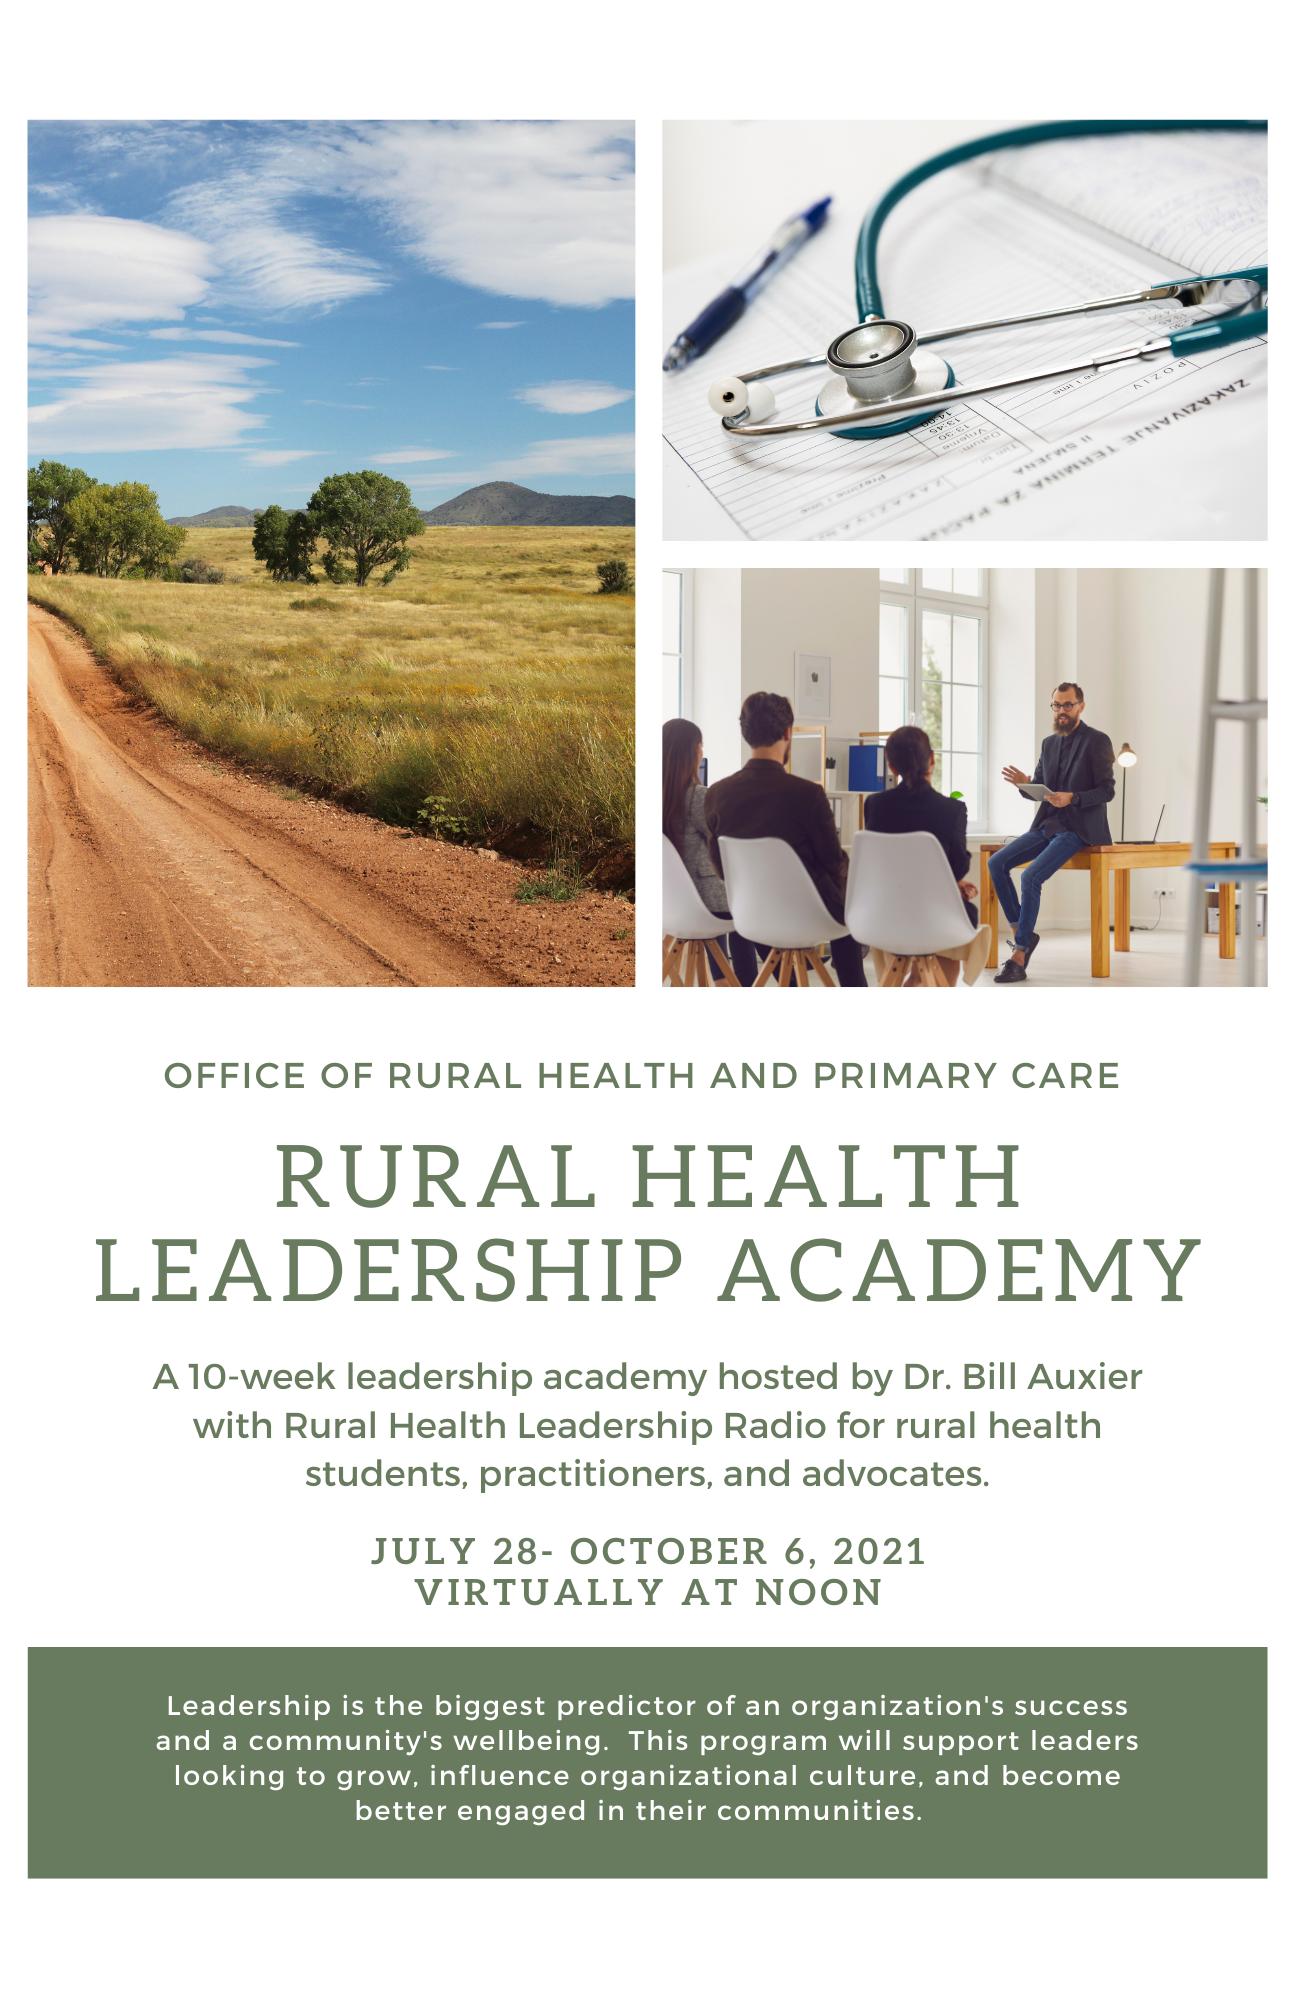 2021 Rural Health Leadership Academy